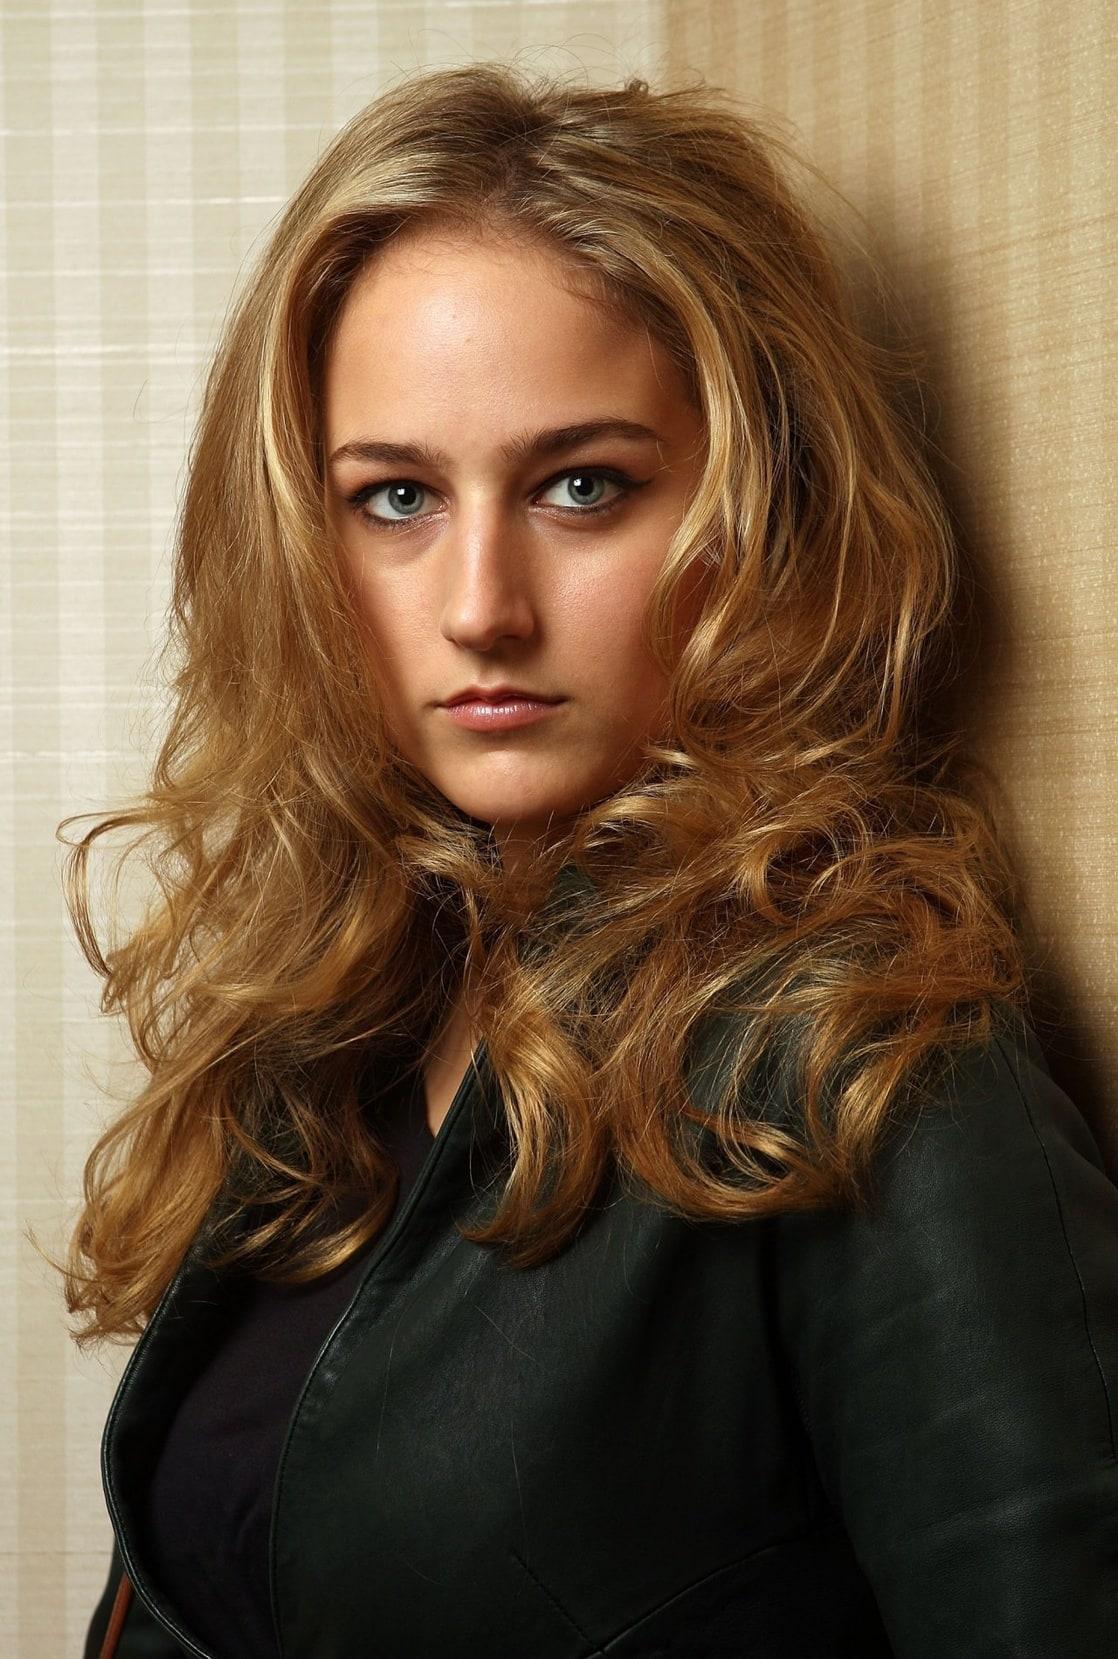 Picture of Leelee Sobieski